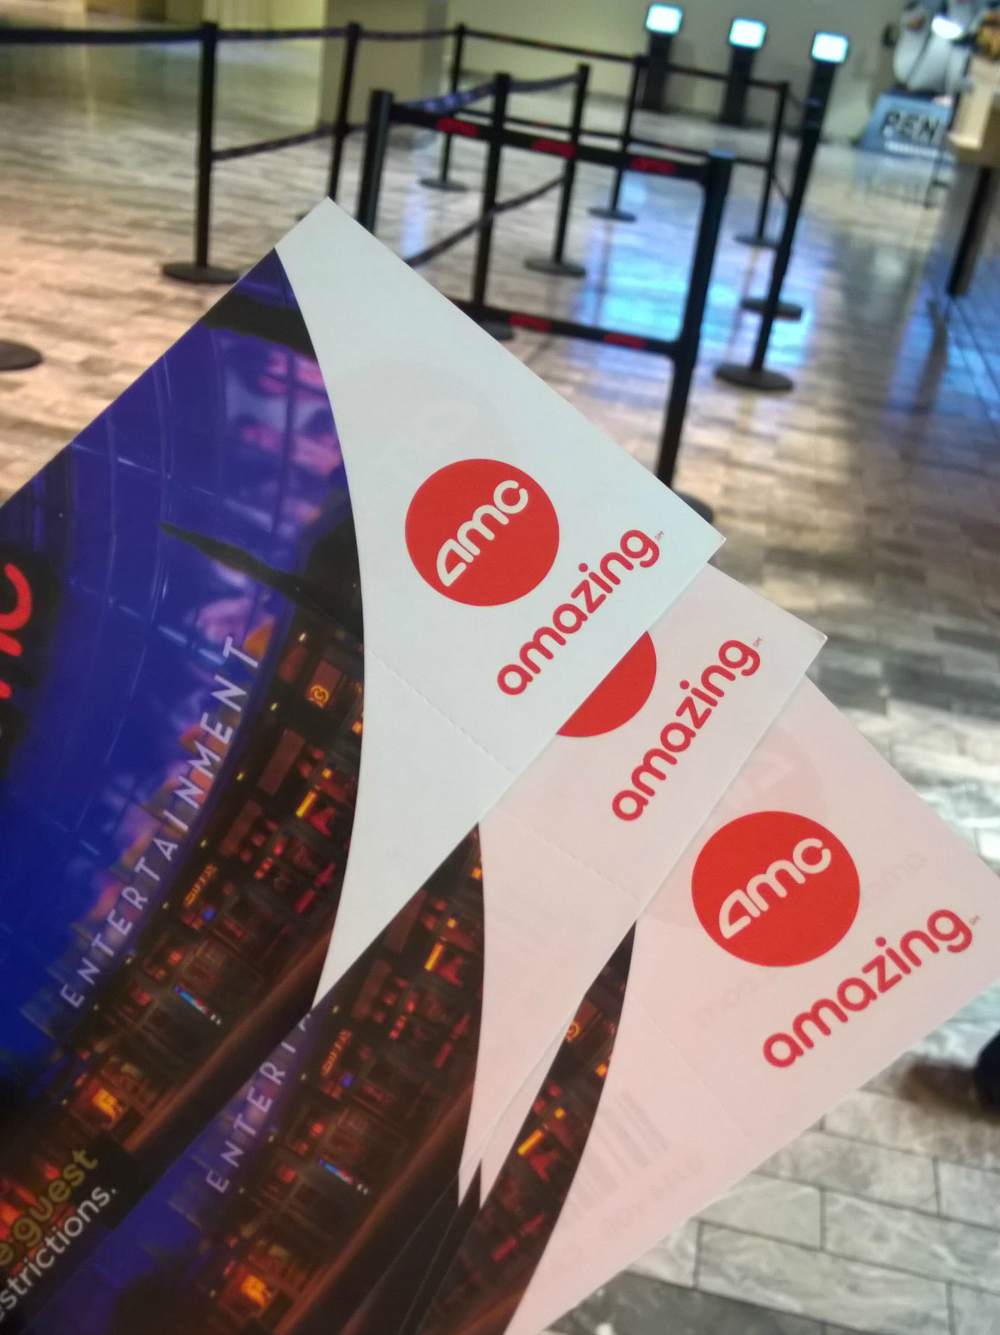 AMC Theatres Coca-Cola #AMCandCocaColaFreestyle